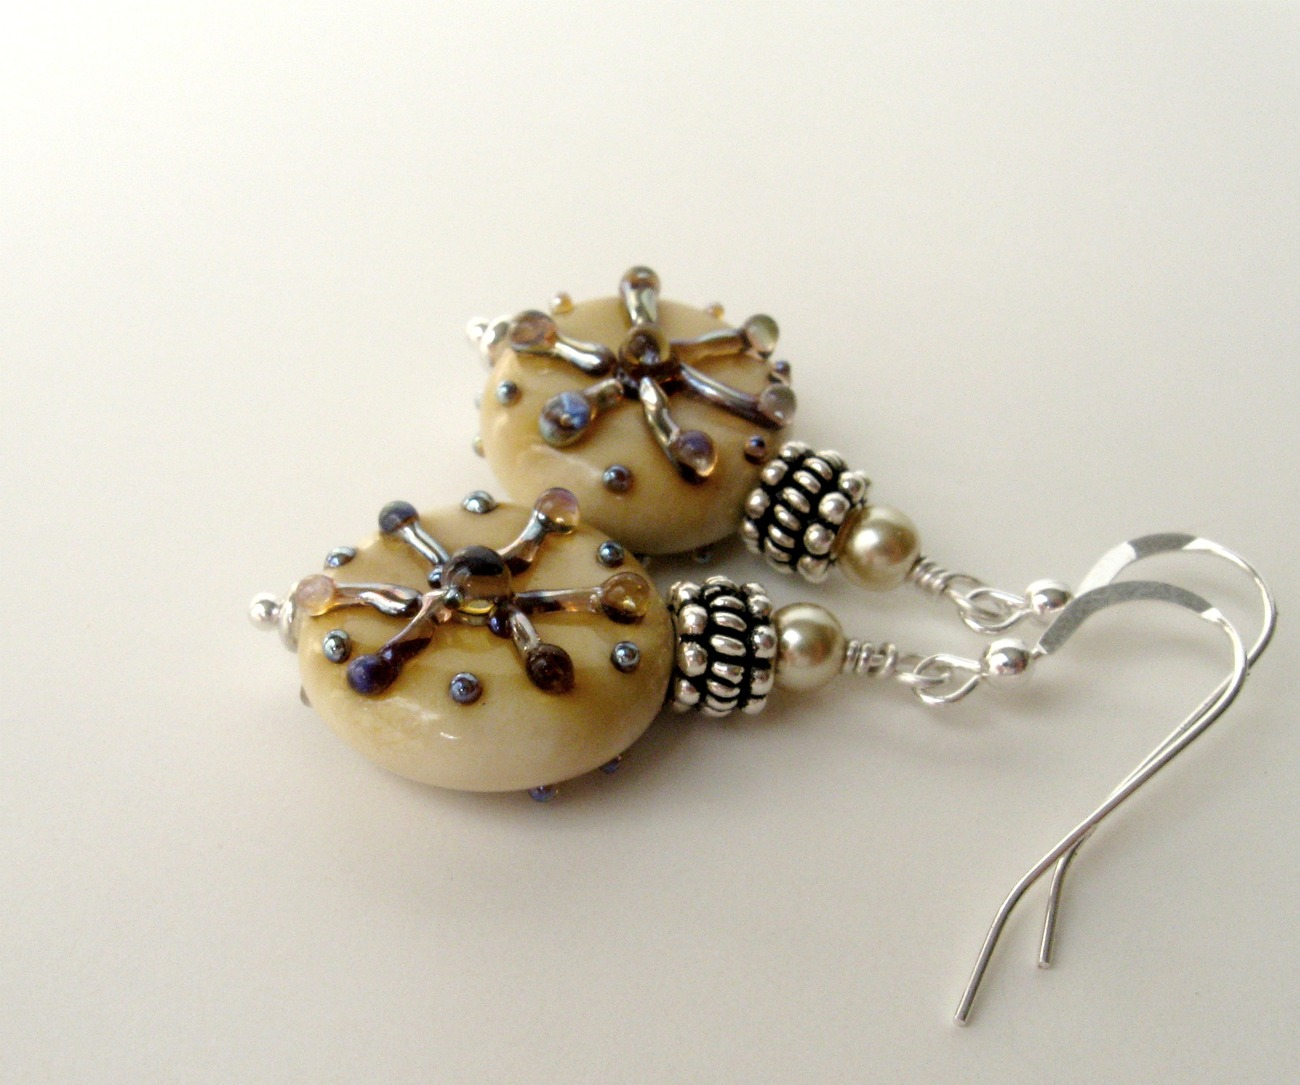 Handmade Ocean Themed Earrings  Earrings. Buttalu Earrings. Indigenous Earrings. 925 Diamond Earrings. Classic Pearl Earrings. Green Jade Earrings. Emerald Cut Sapphire Earrings. Creole Earrings. Handmade Paper Earrings